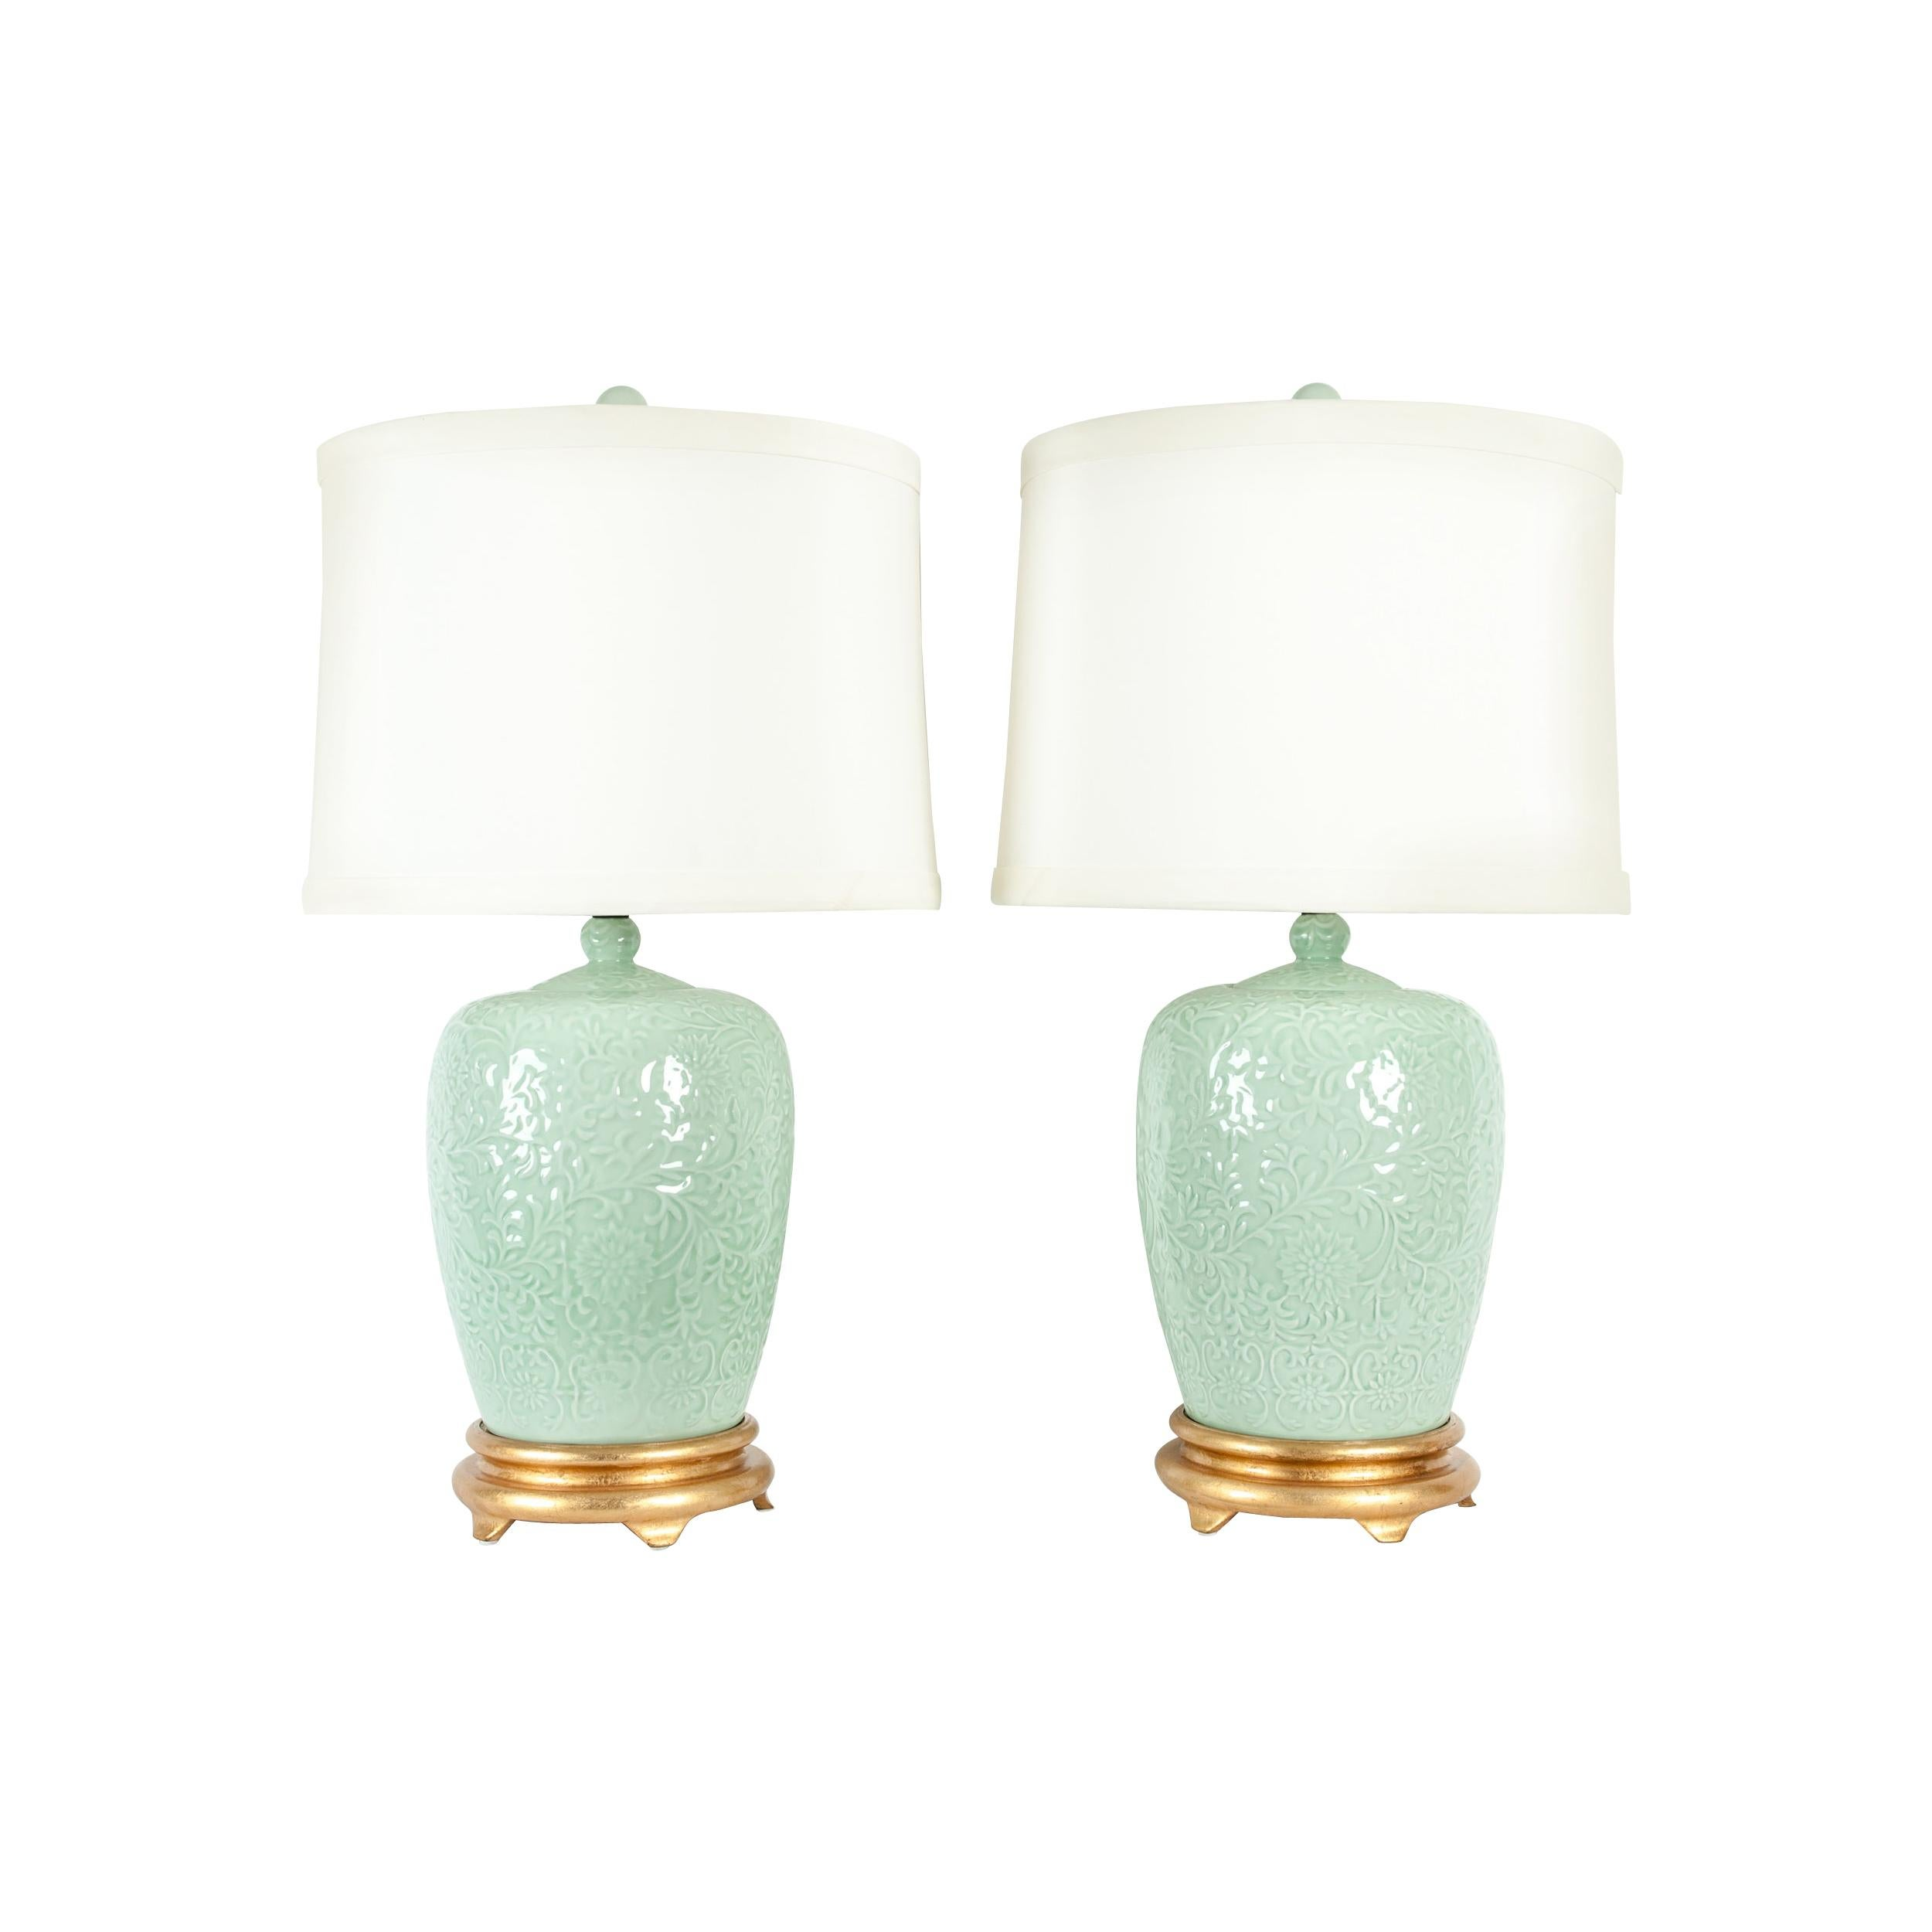 Midcentury Porcelain Pair of Lamp / Gilded Wooden Base